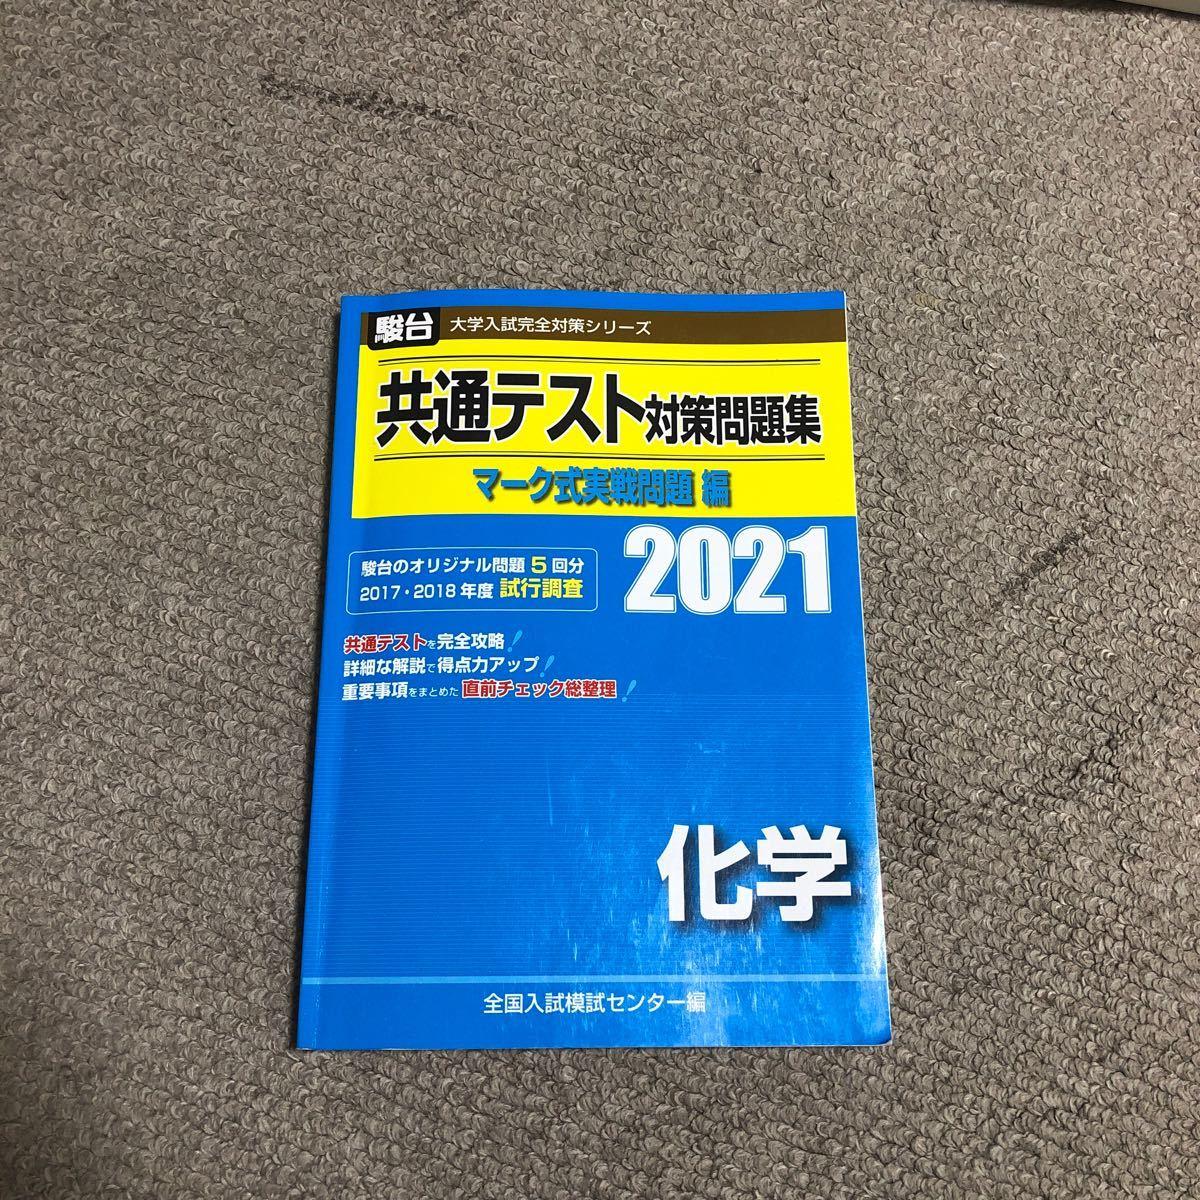 共通テスト化学対策問題集 定価1080円+税